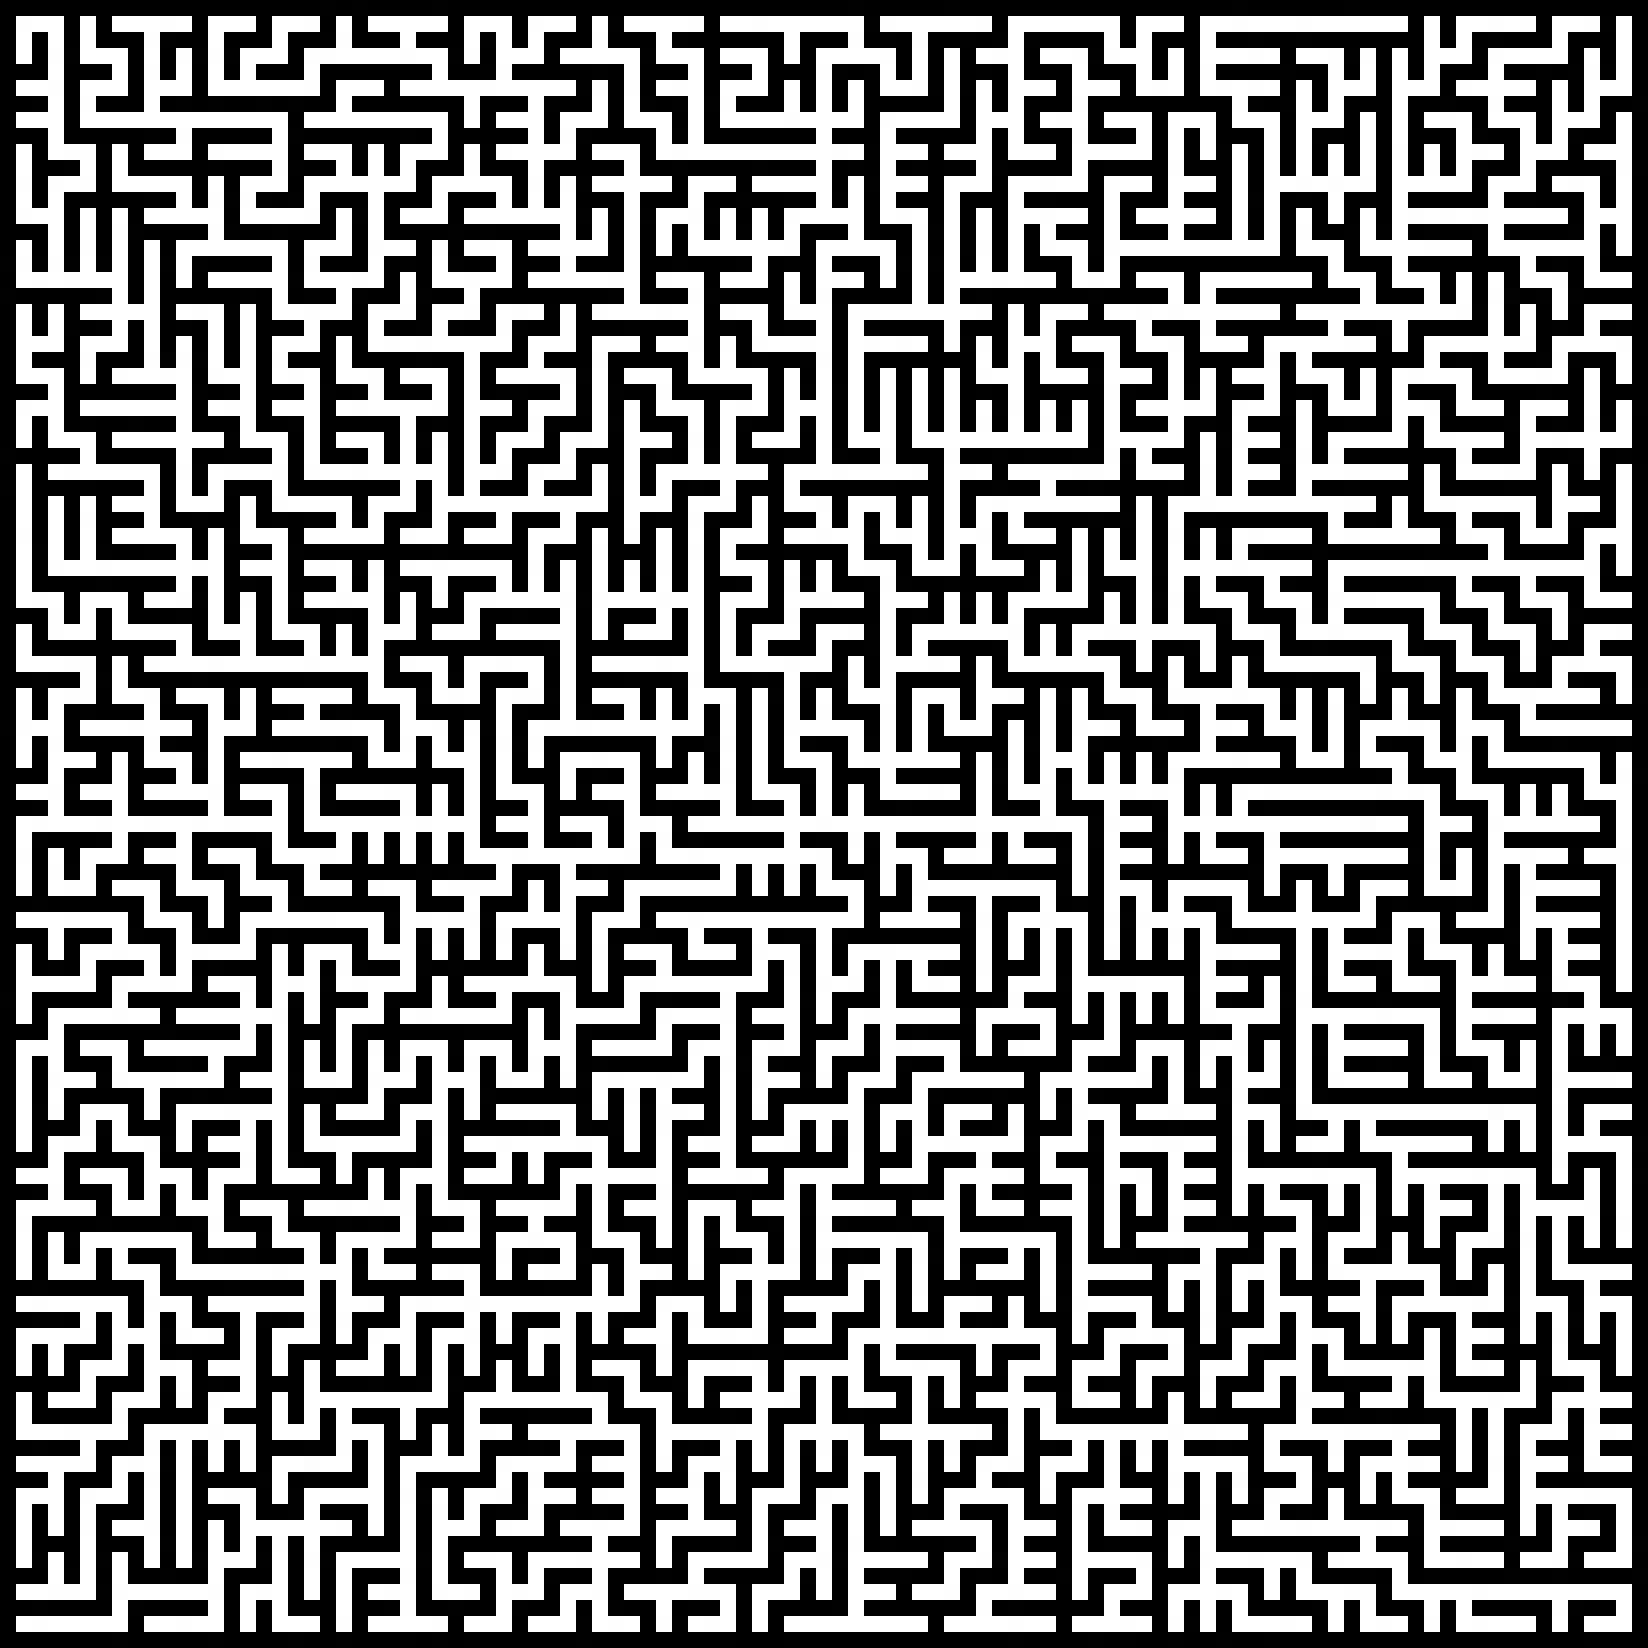 zldlabyrinth.jpg